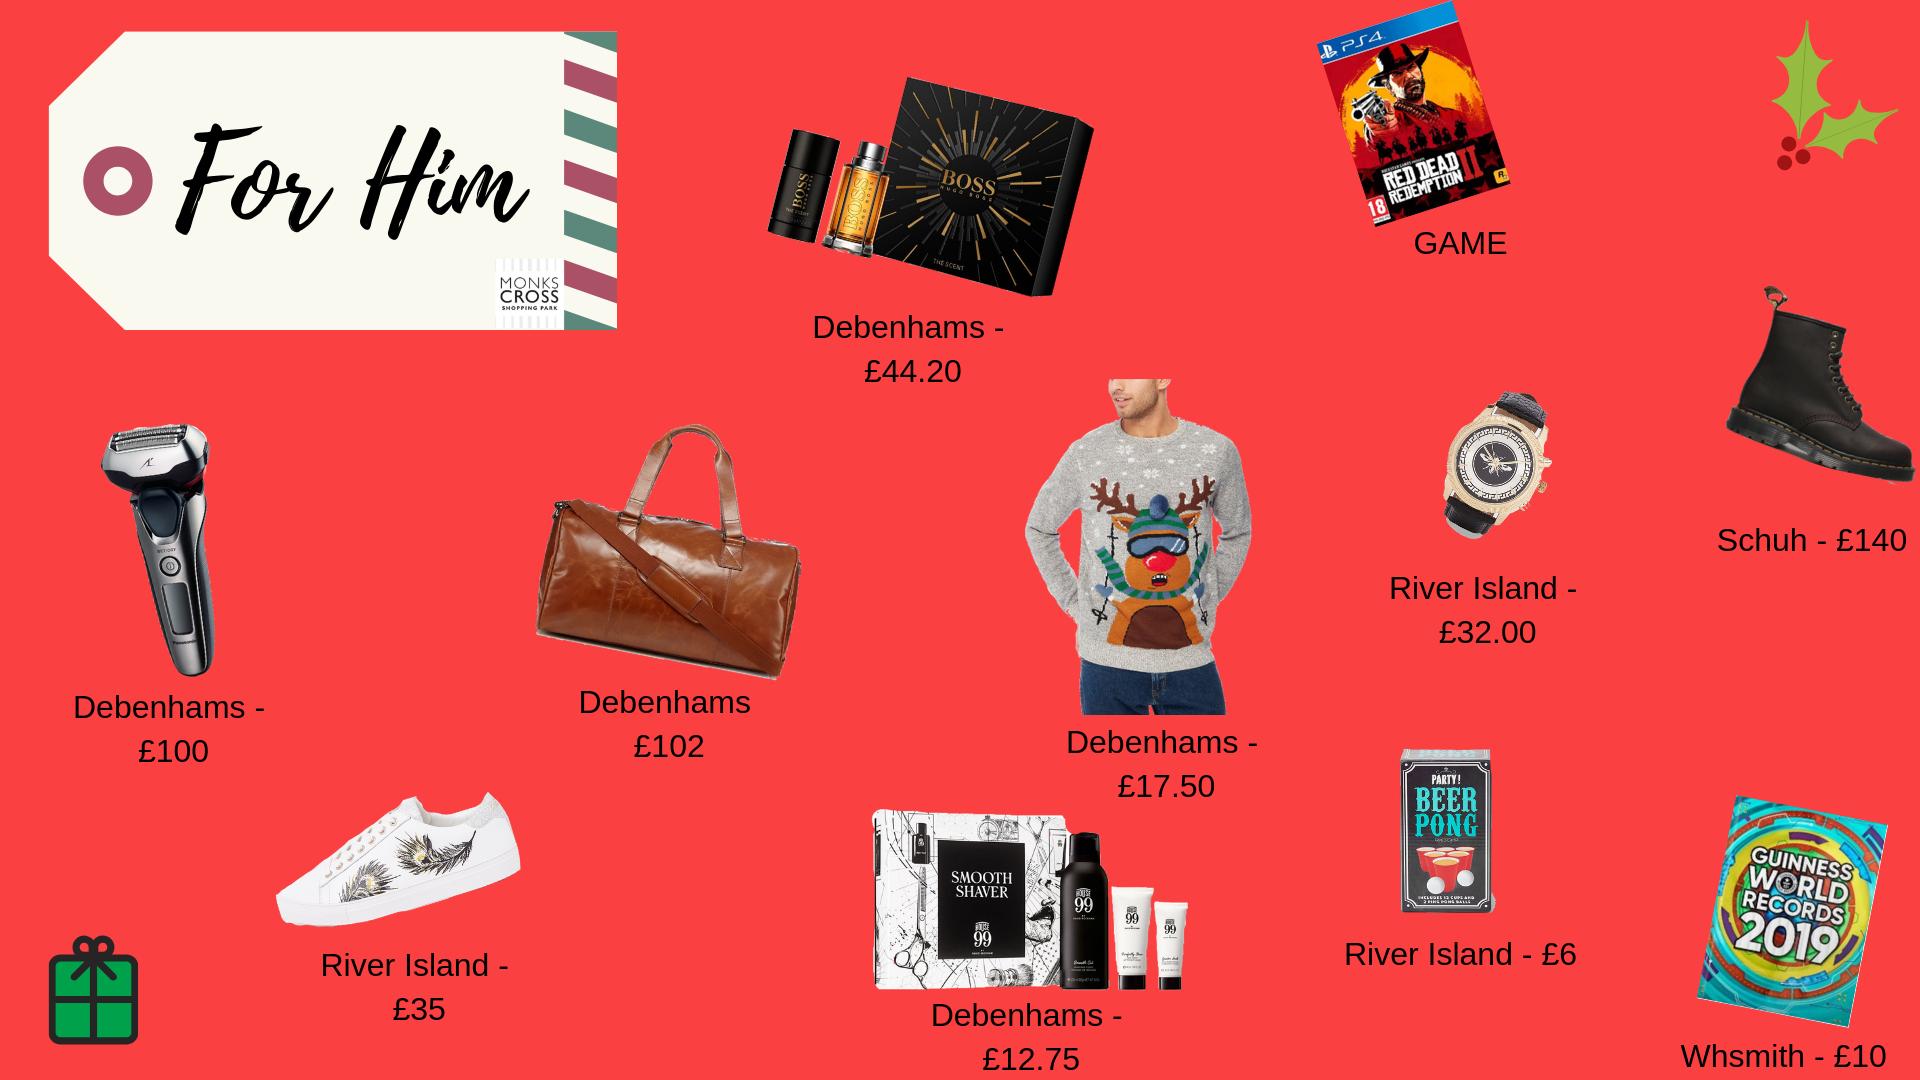 Christmas Gift Guide.Christmas Gift Guide Monks Cross Shopping